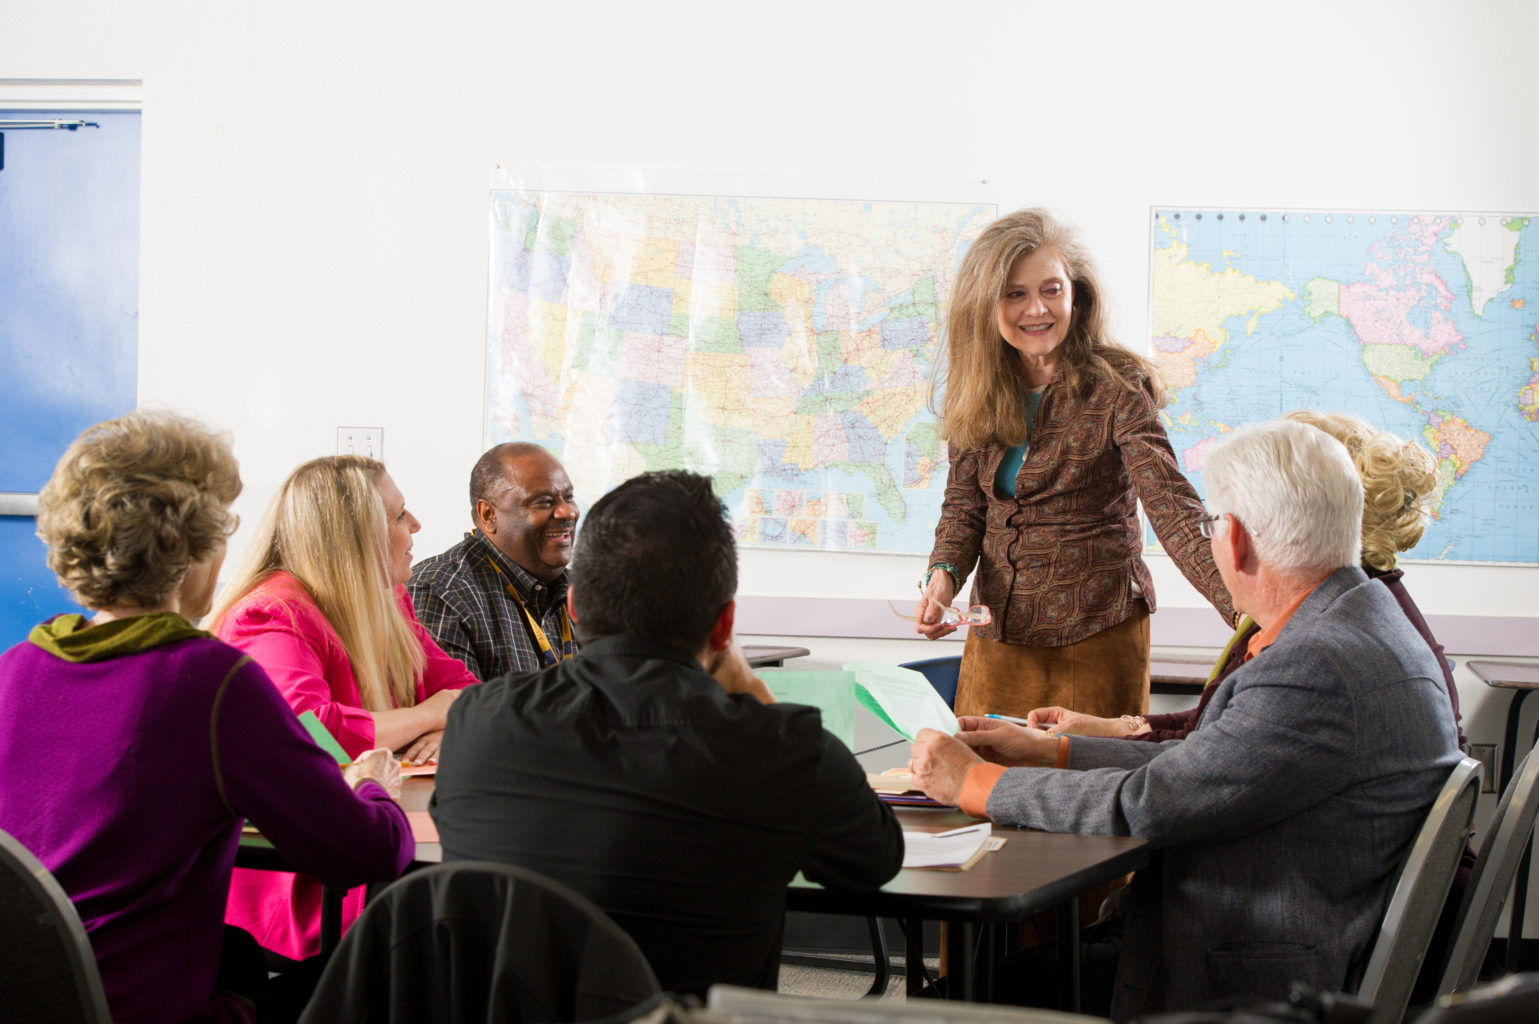 Teacher speaking to fellow faculty members